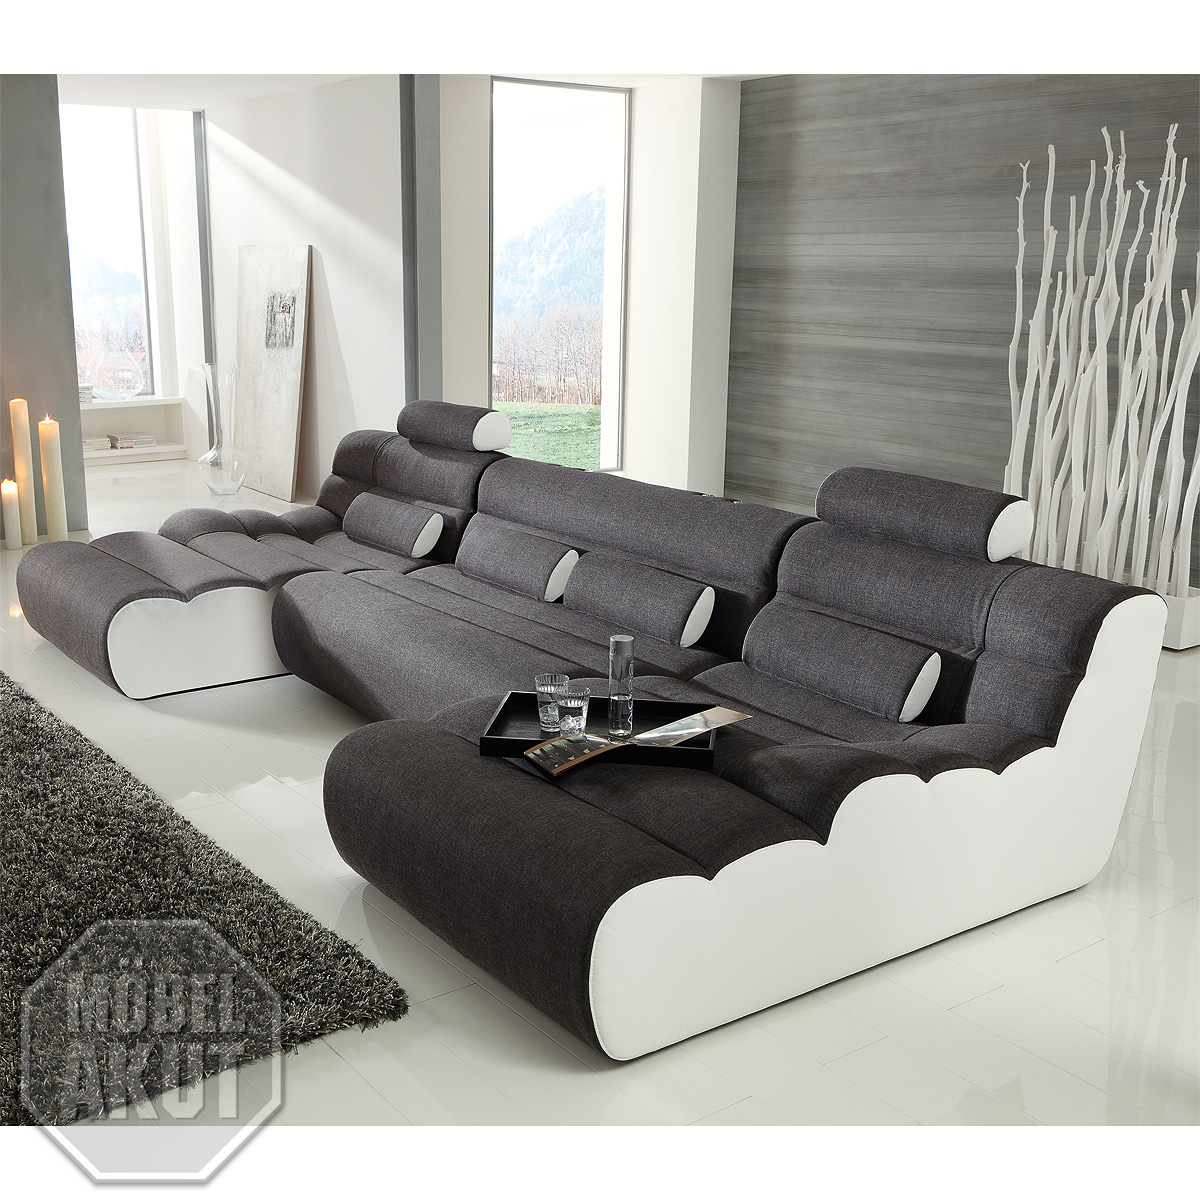 sofa elements bigsofa megasofa wohnlandschaft ottomane anthrazit wei neu ebay. Black Bedroom Furniture Sets. Home Design Ideas